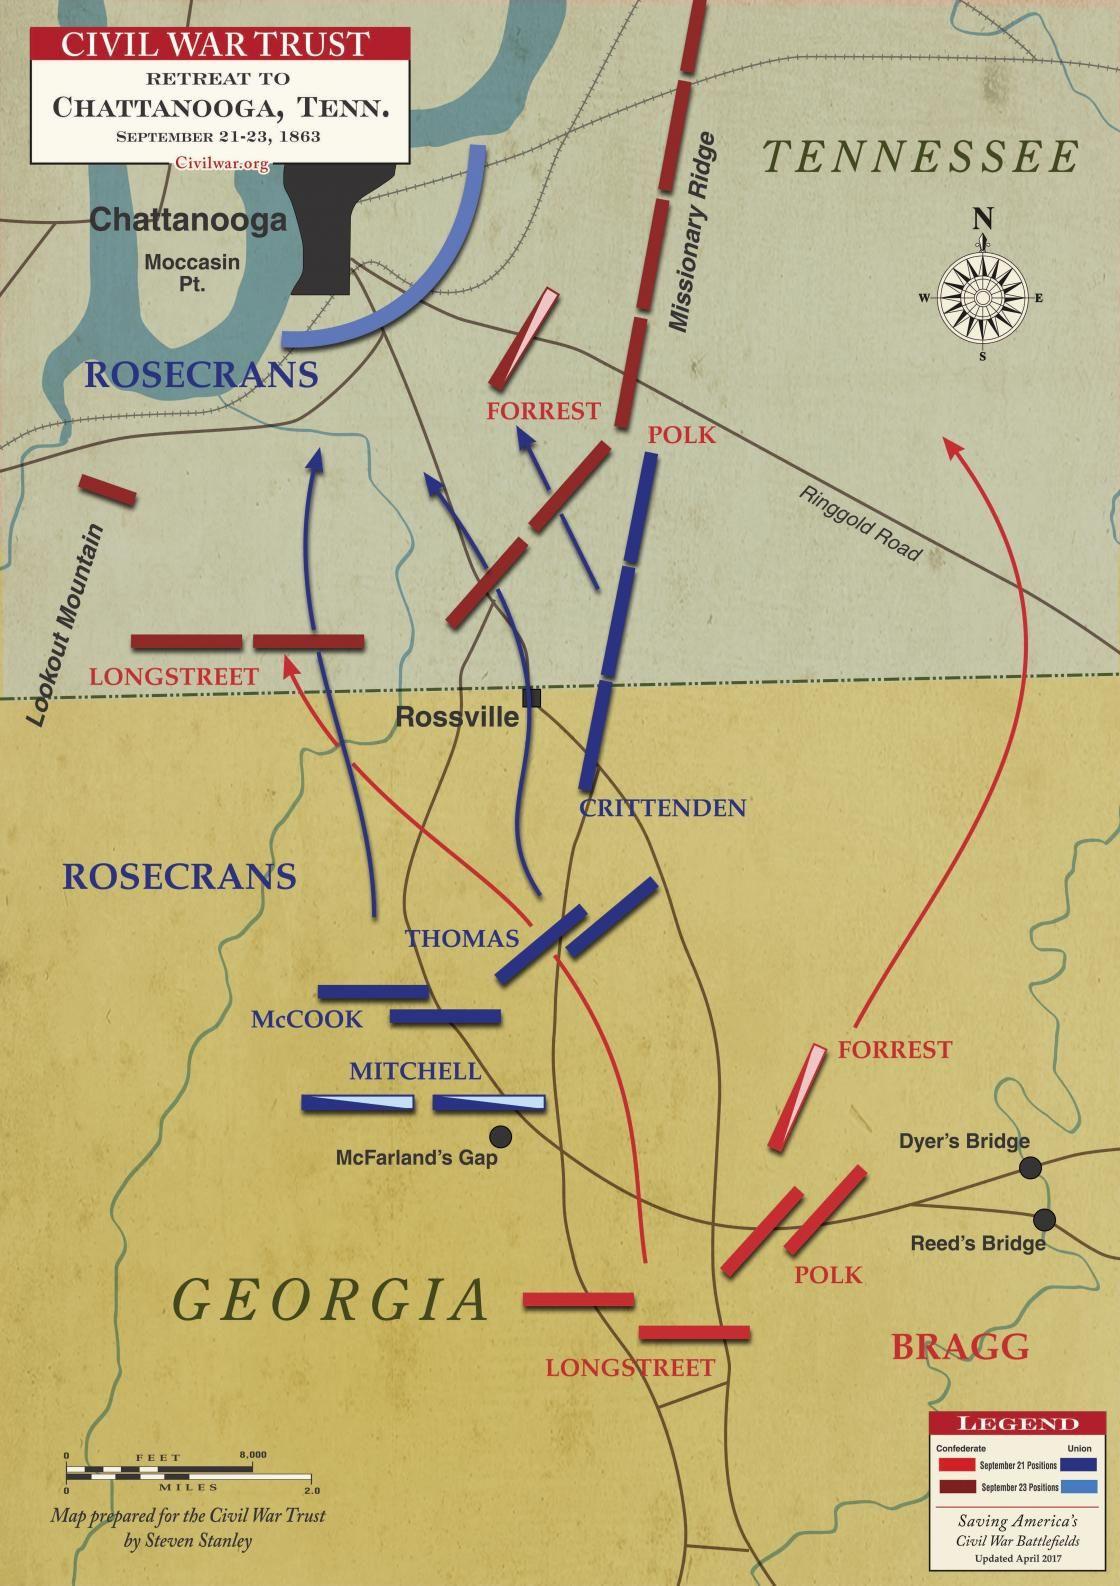 Civil War Map Worksheet Road to Chattanooga